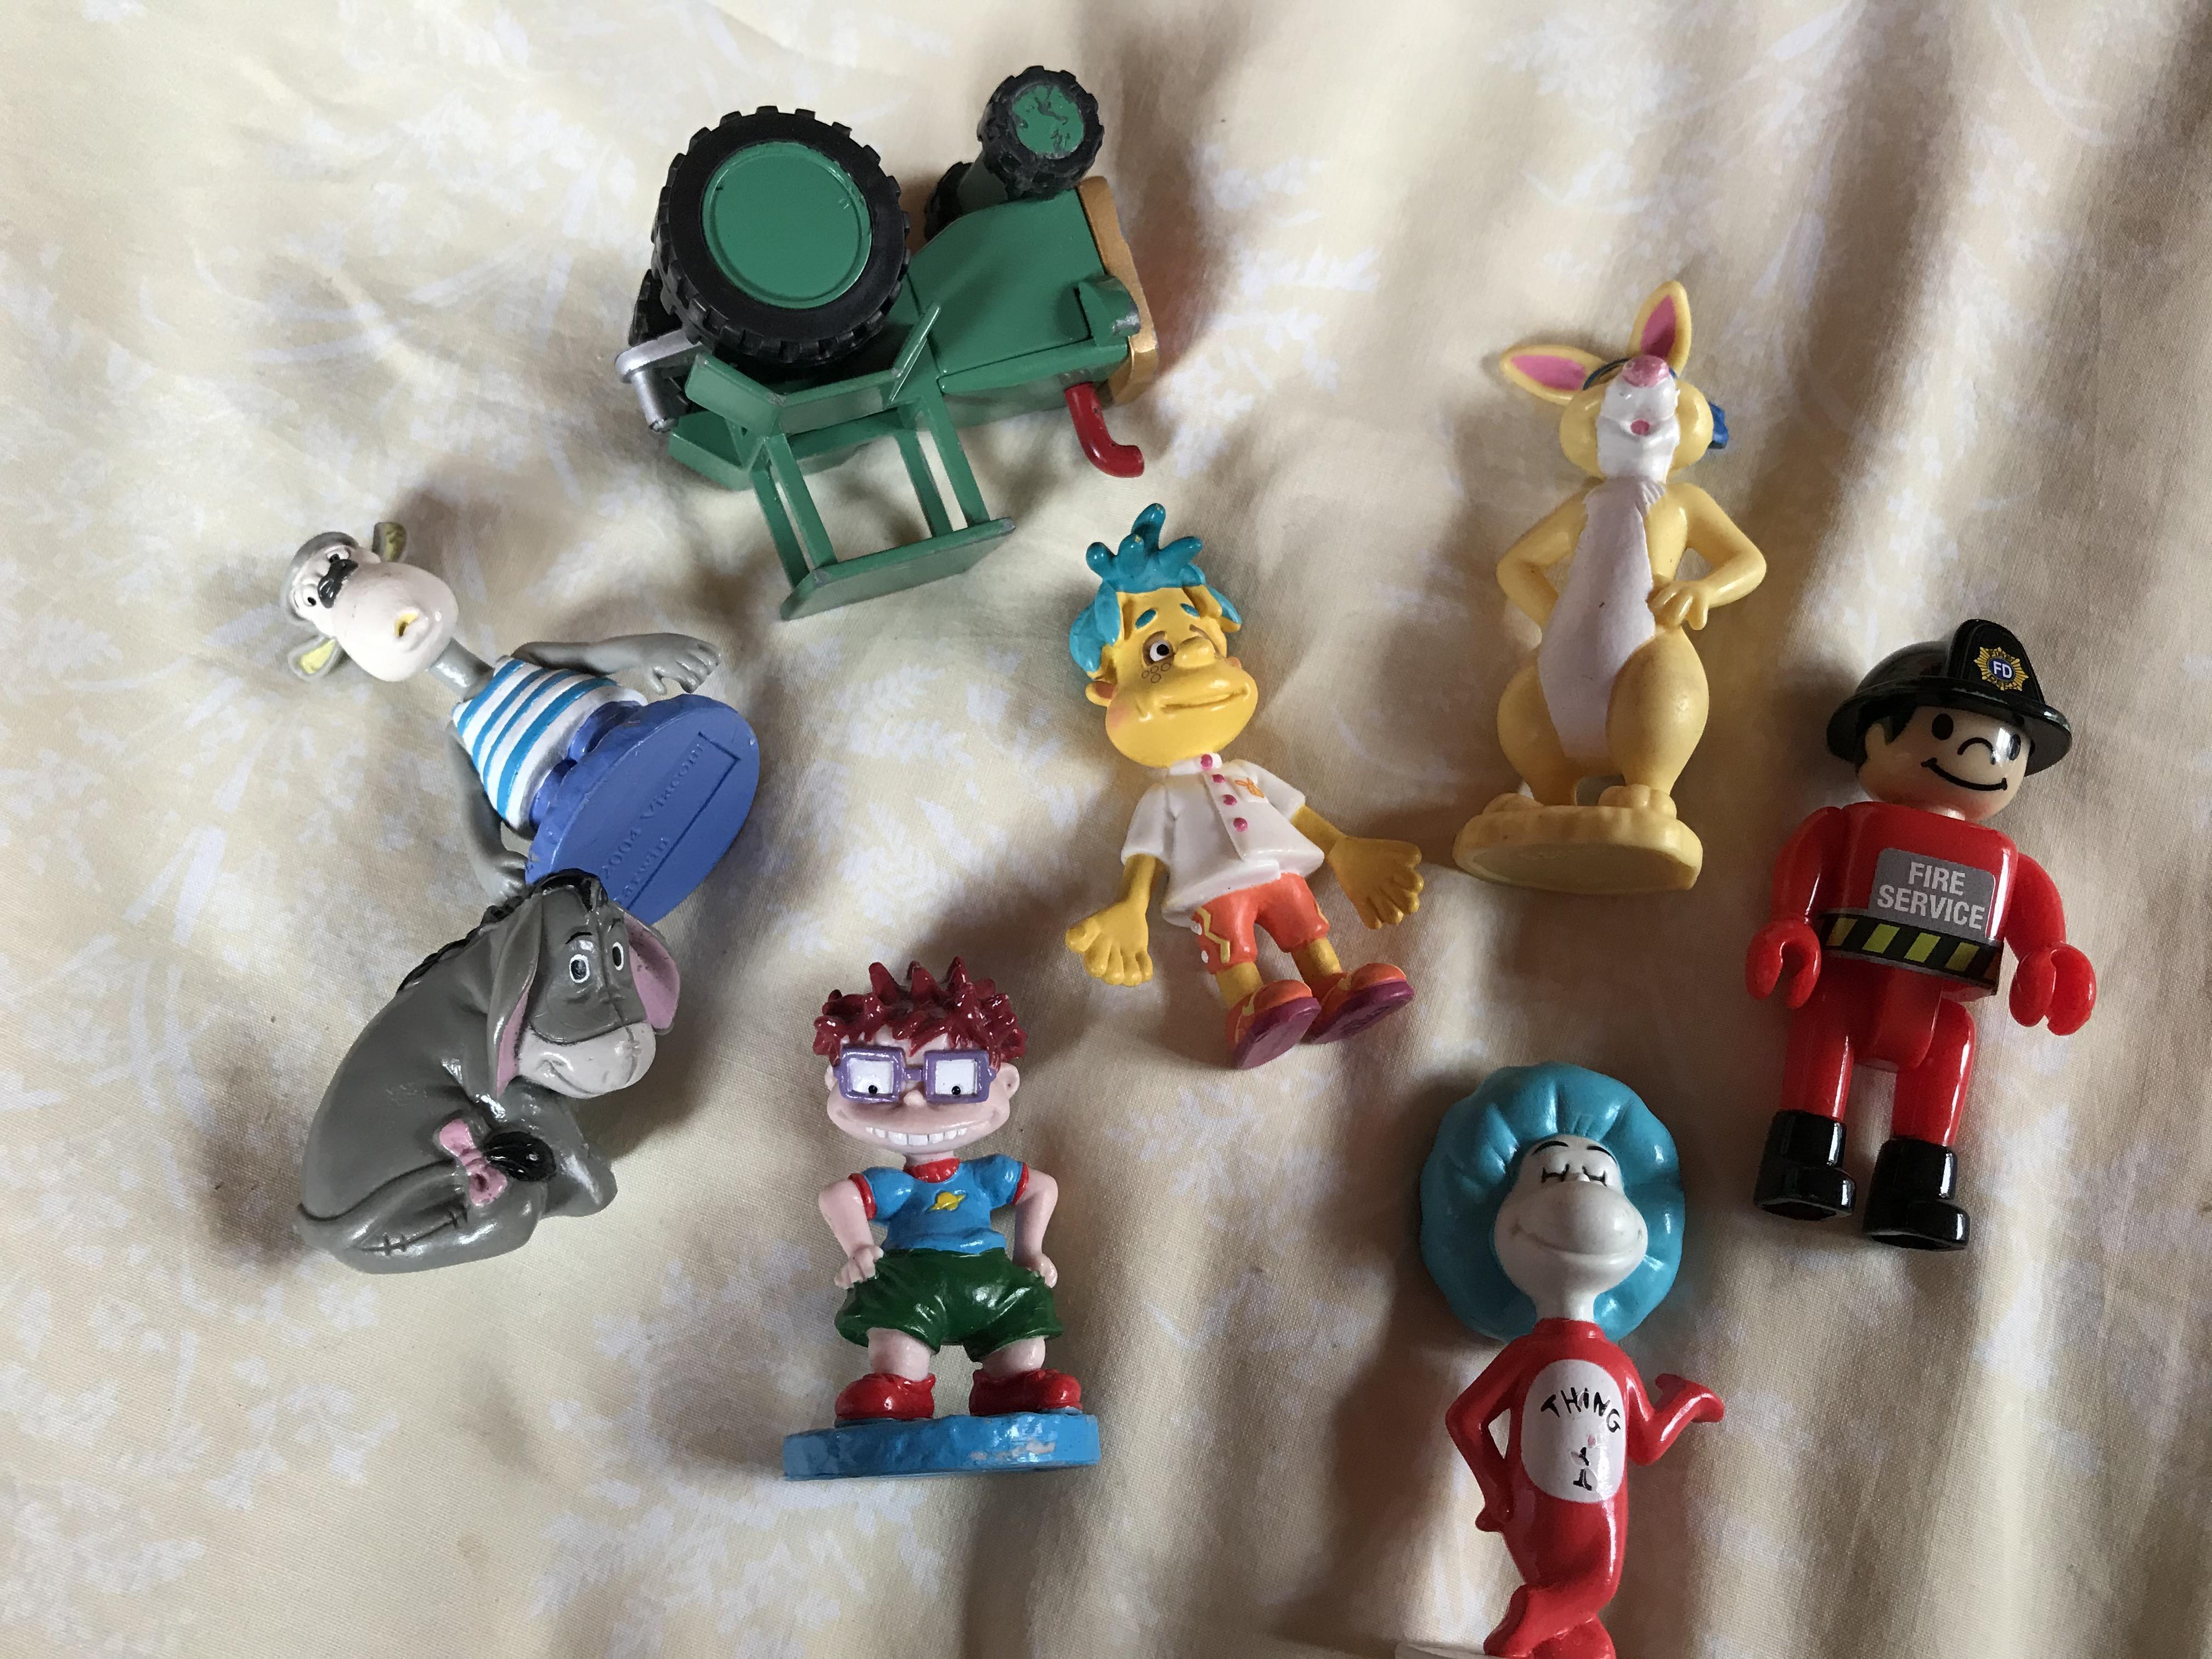 Cartoon characters.